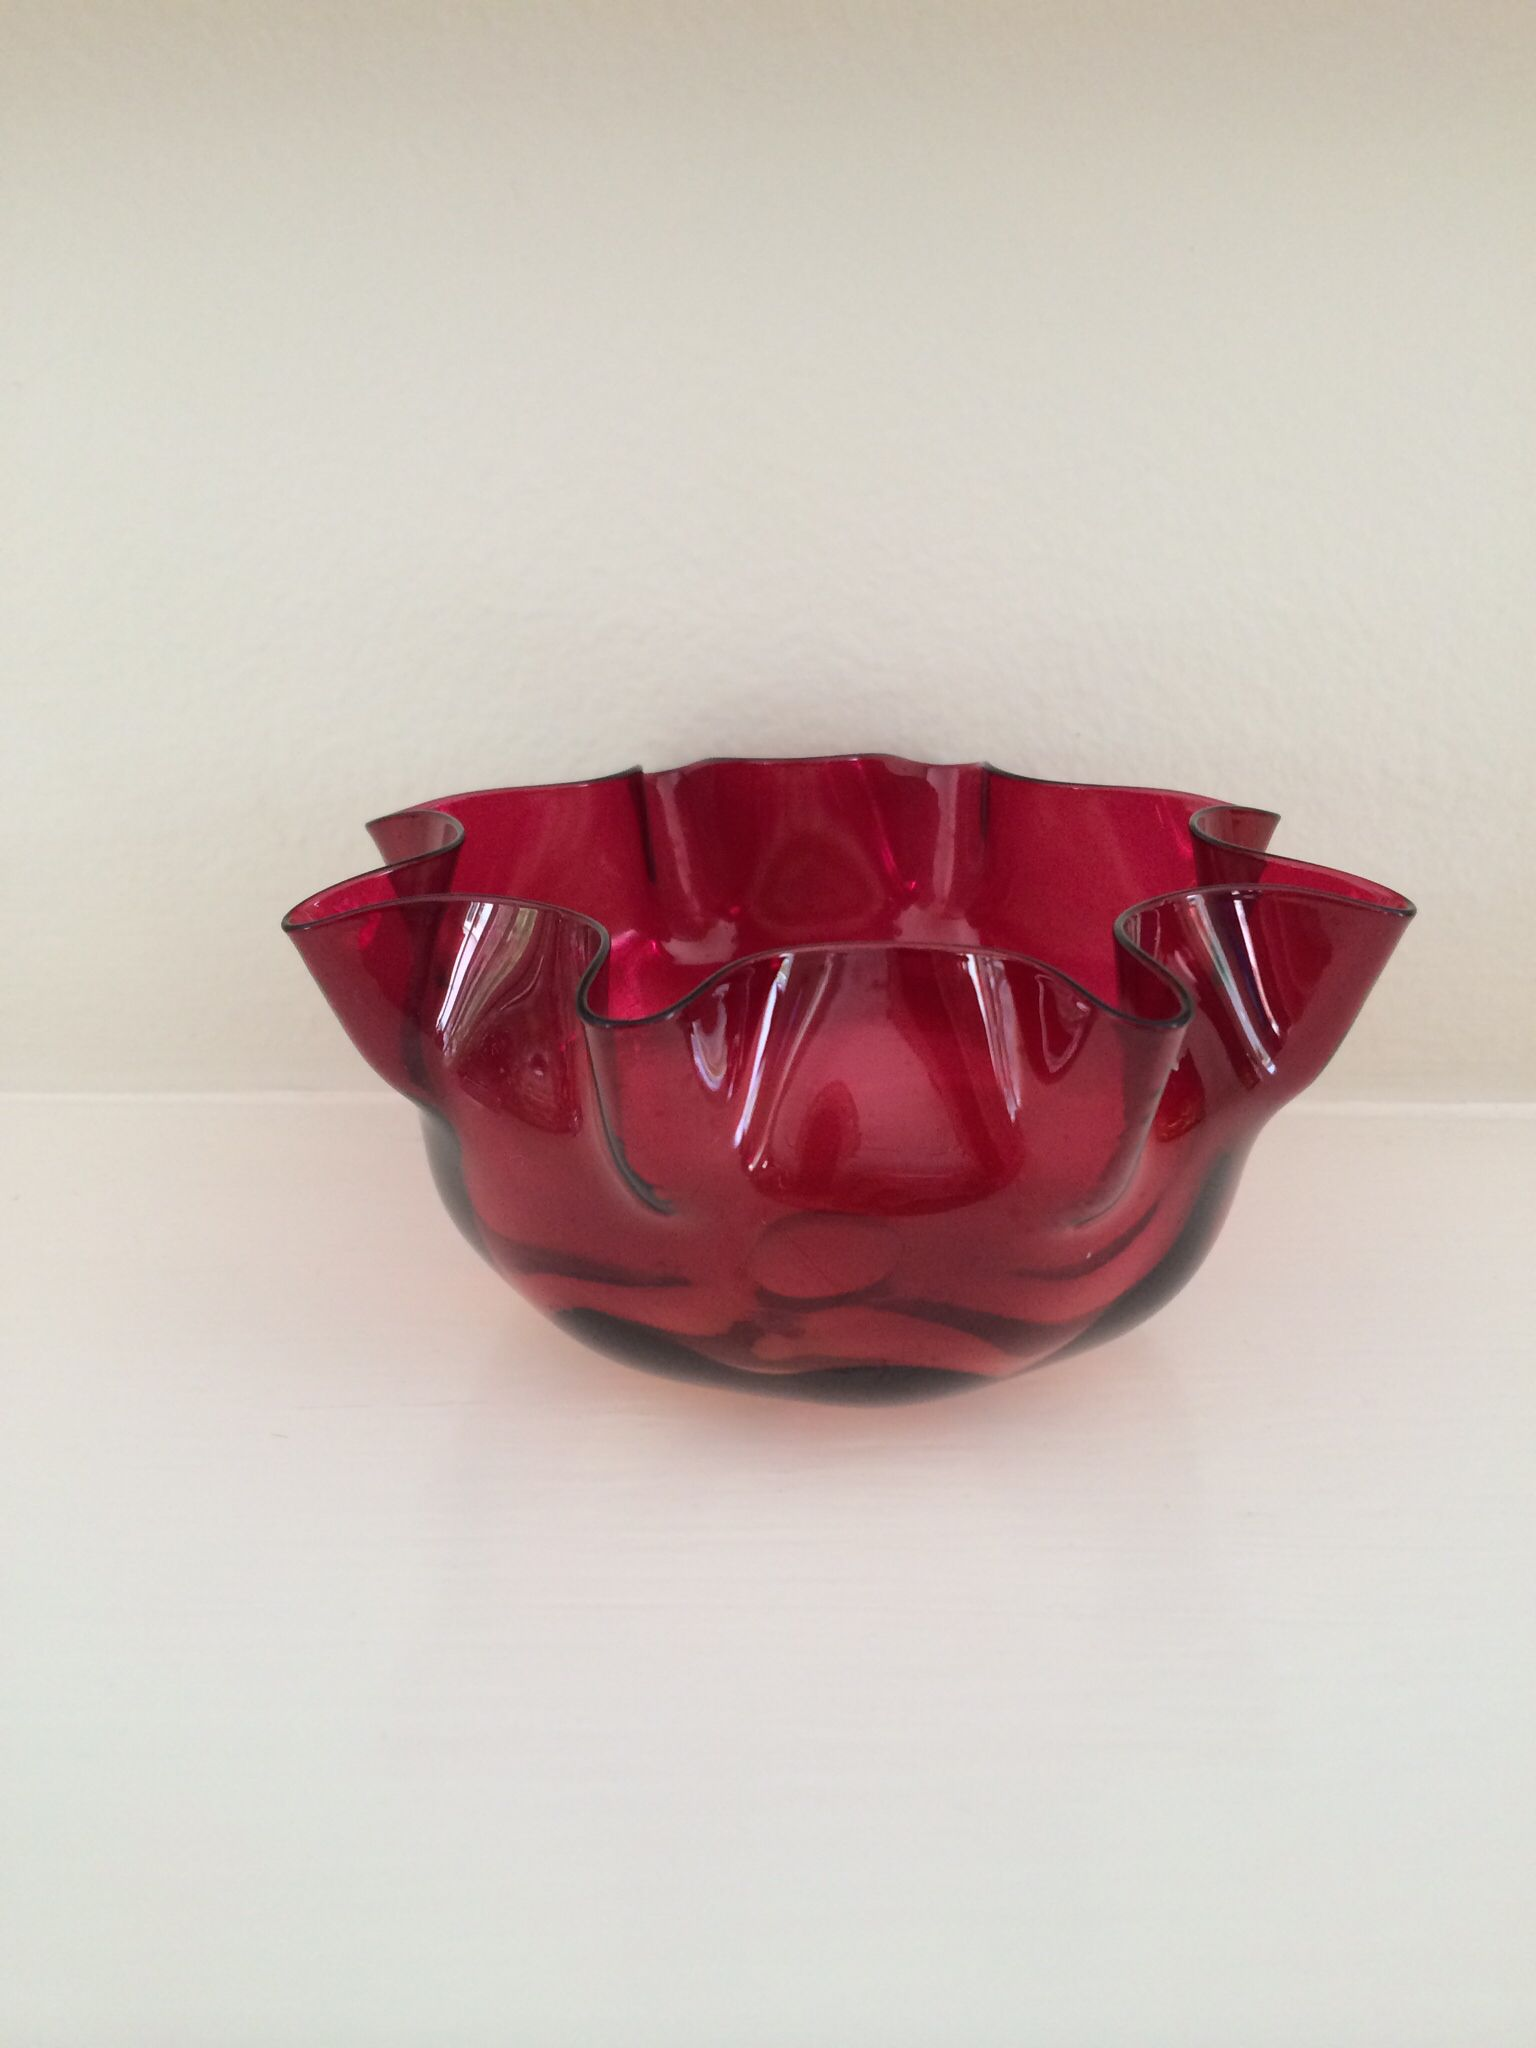 Mt Washington Rose Amber Finger Bowl With 8 Ruffle Rim 5 3 4 Inch Doa And 2 3 4 Inch Hoa Hfcol Bowl Decorative Bowls Decor